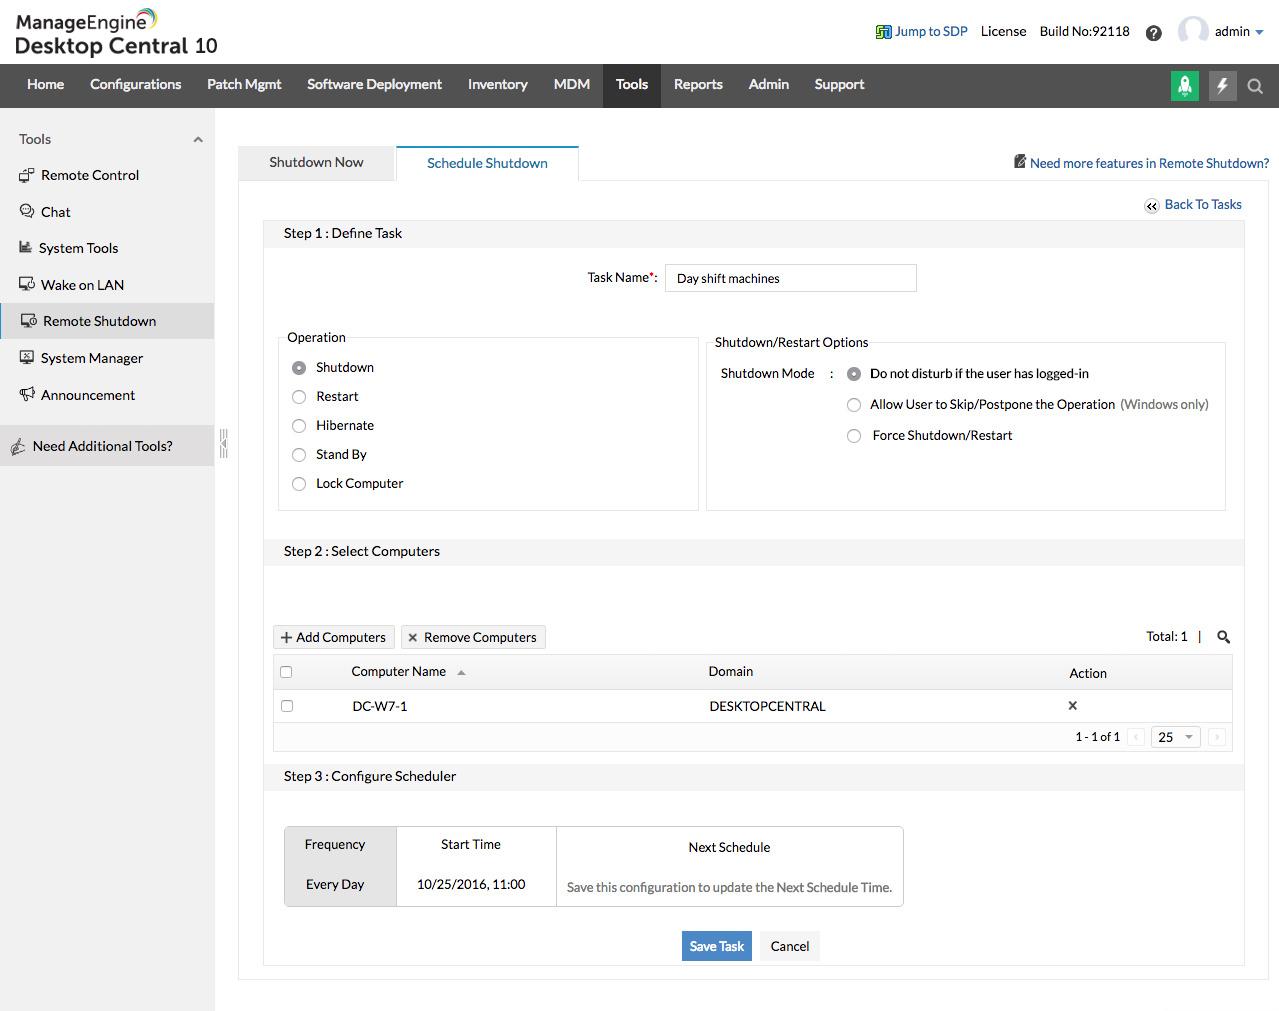 Computer power management software - ManageEngine Desktop Central